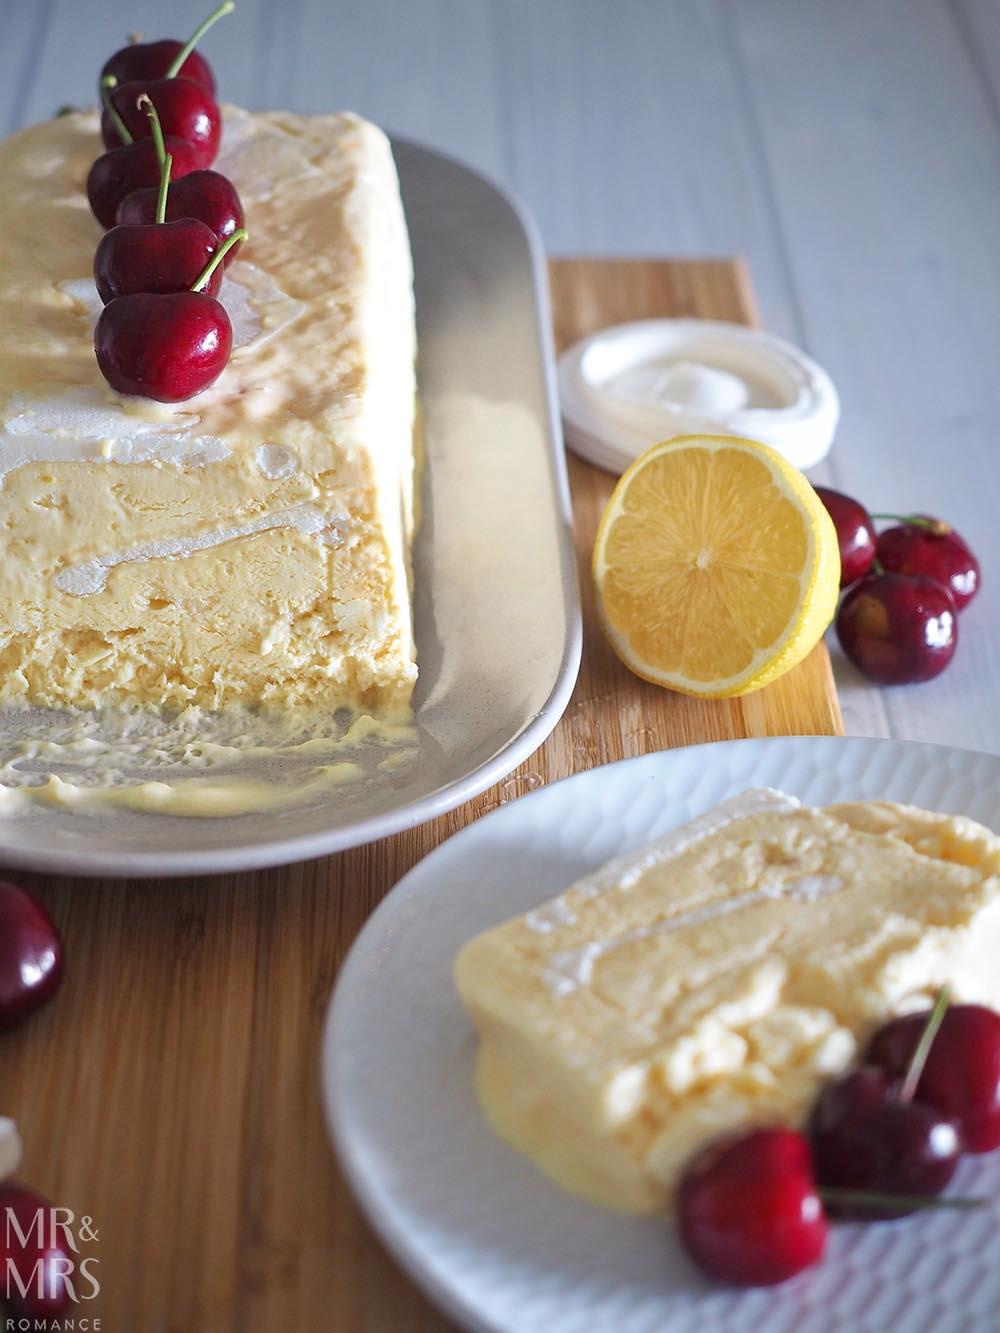 Lemon Meringue Semifreddo Recipe - serving suggestion